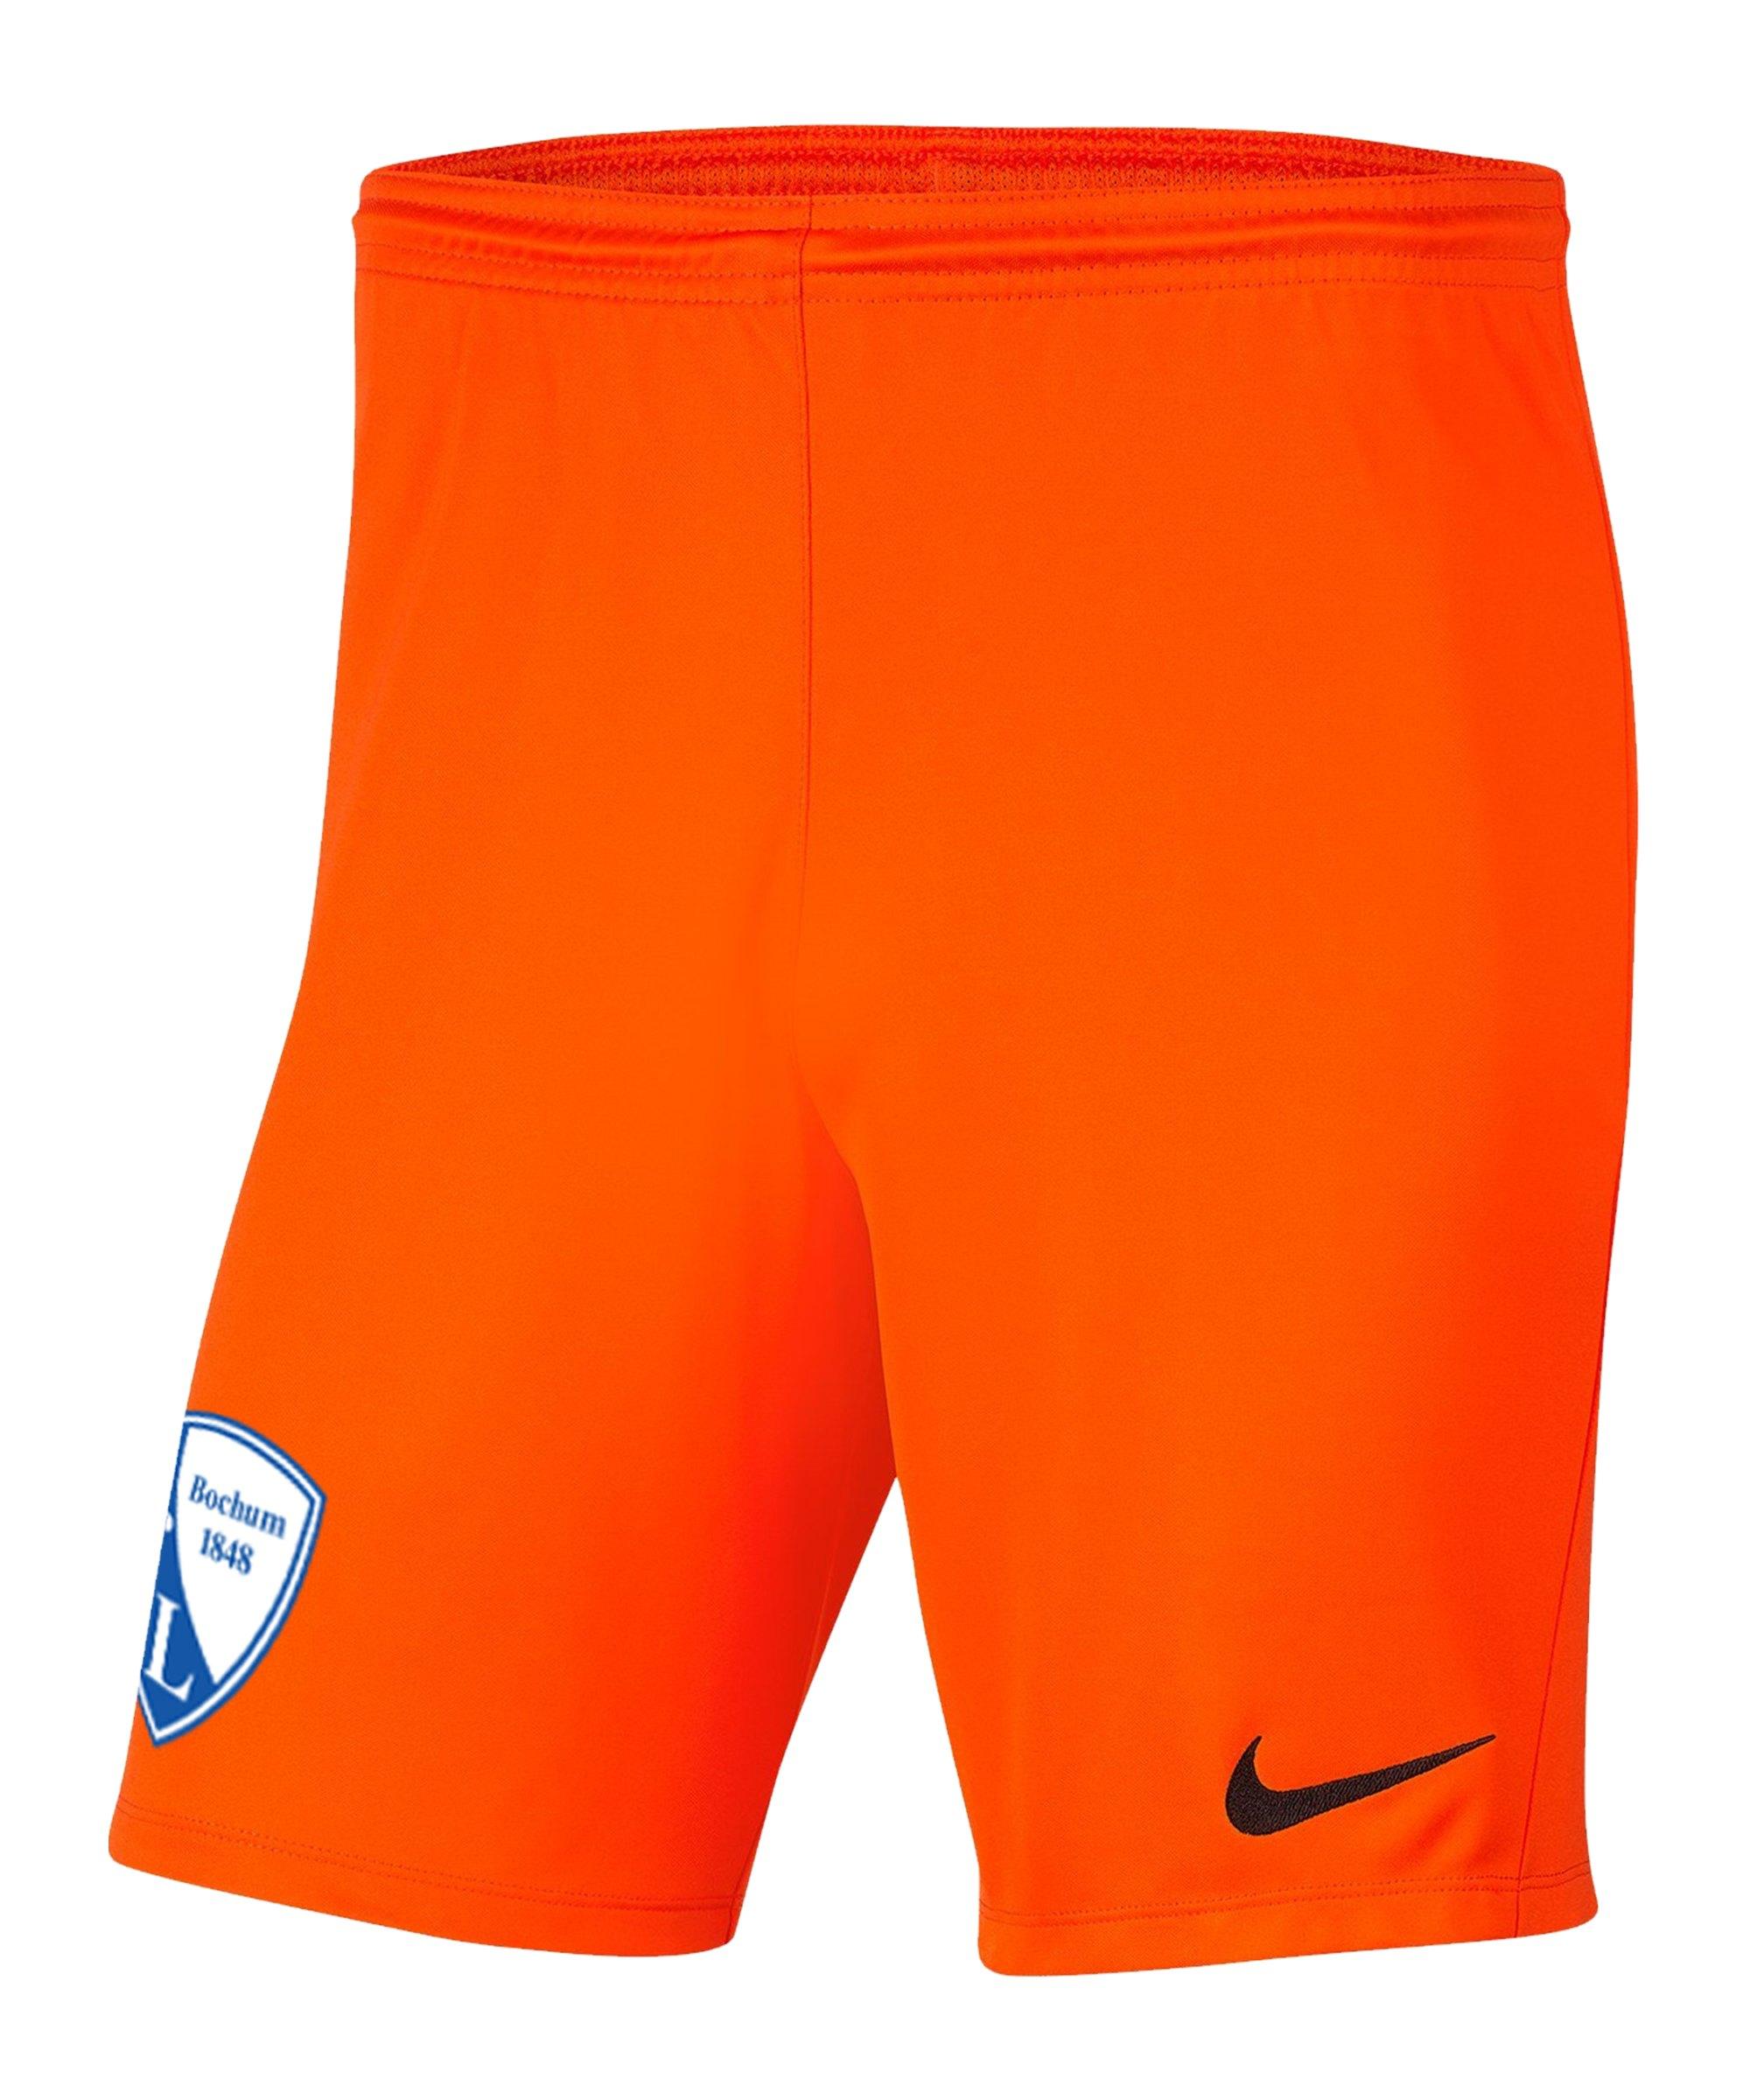 Nike VfL Bochum TW Short 20/21 Orange F819 - orange